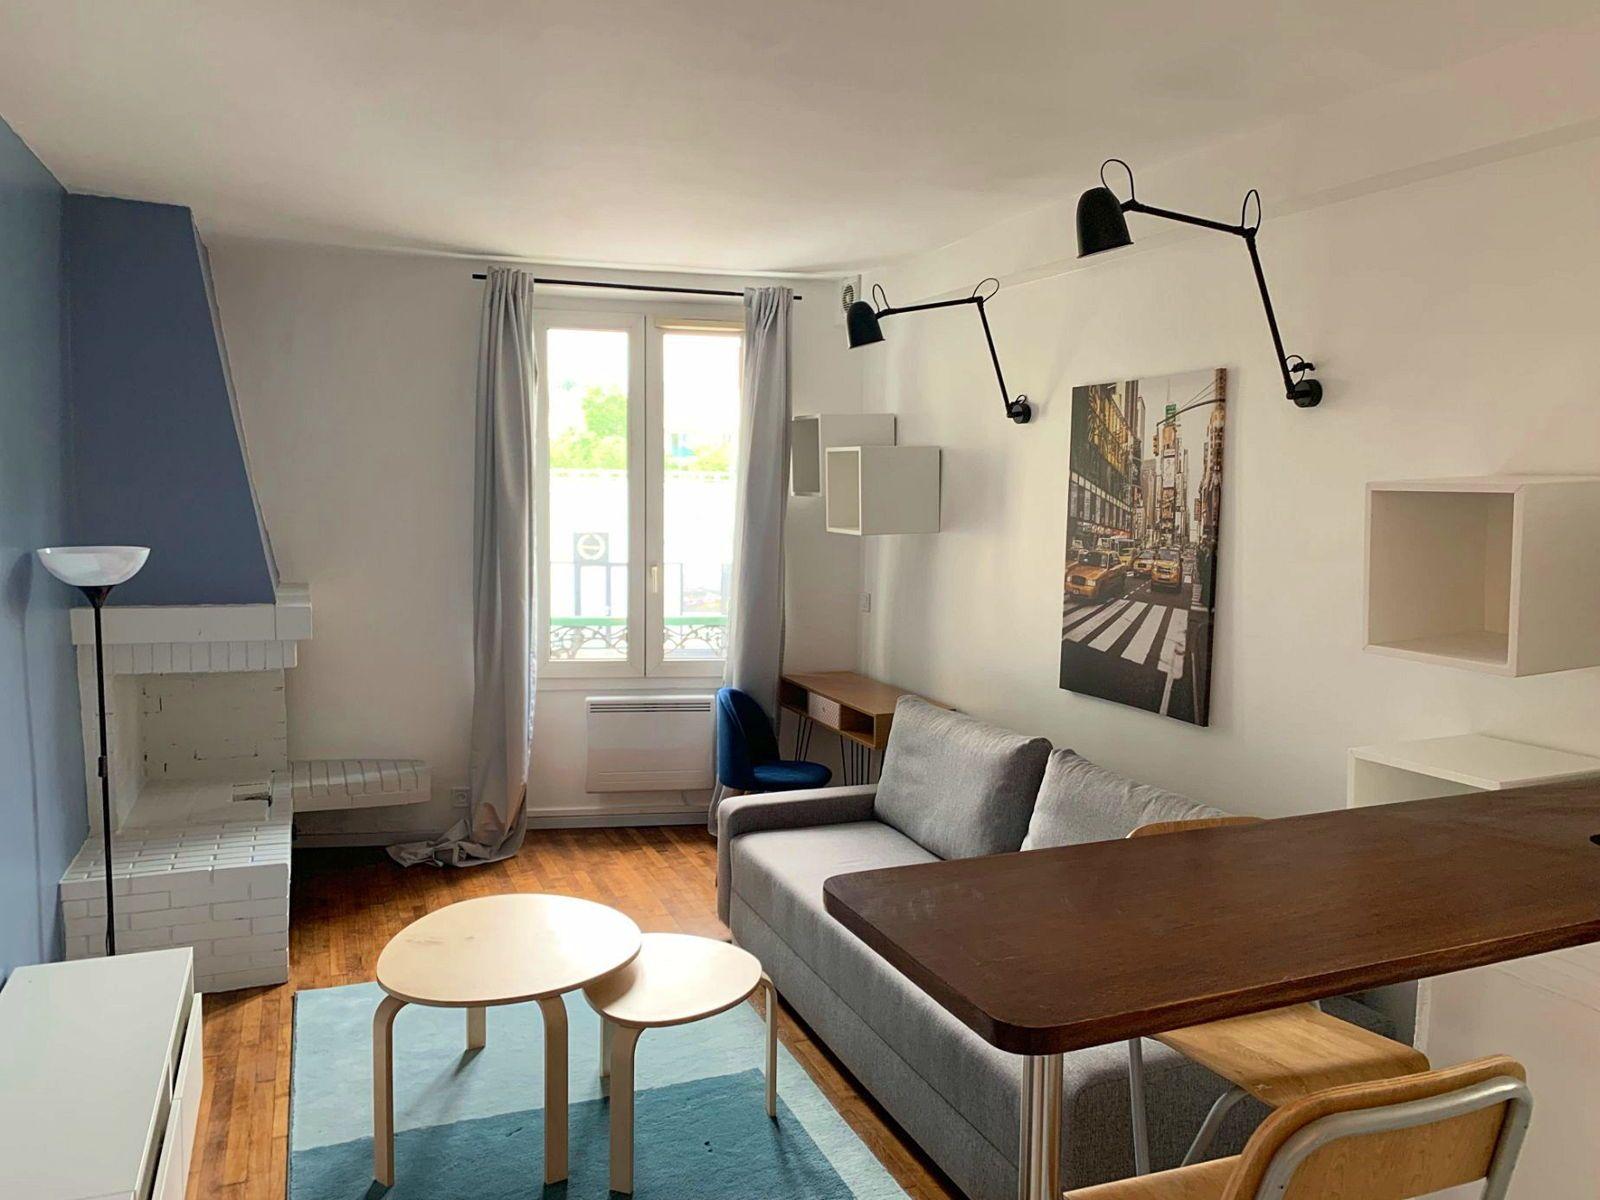 Loue Studio Meublé Design Rueil Centre, RER A à 5min - 24m²